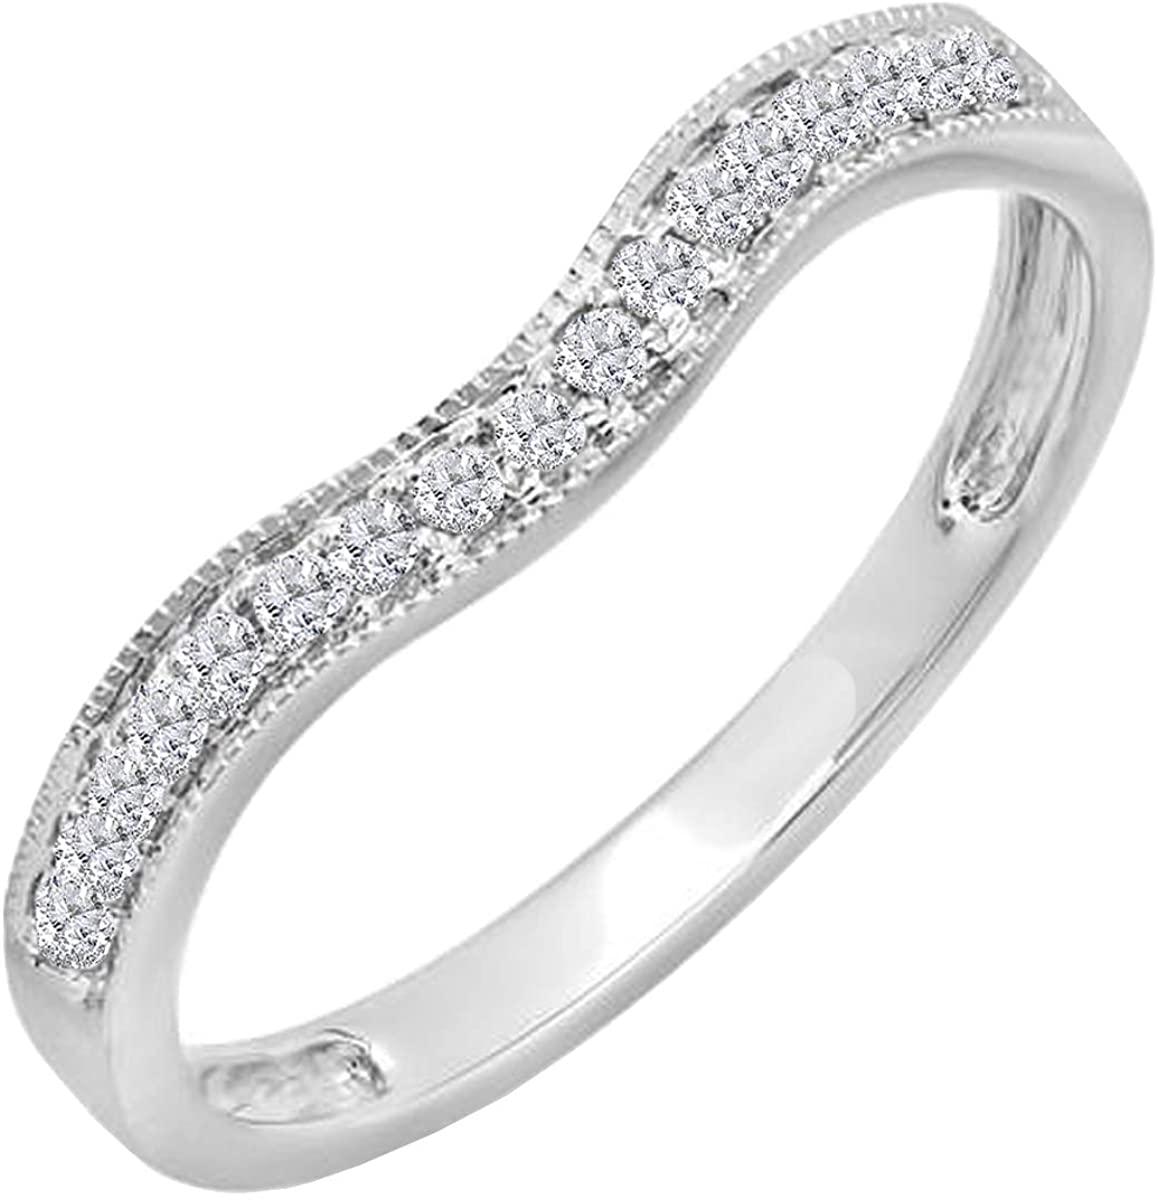 0.15 Carat (ctw) 10K Gold Round Diamond Ladies Anniversary Wedding Band Guard Ring